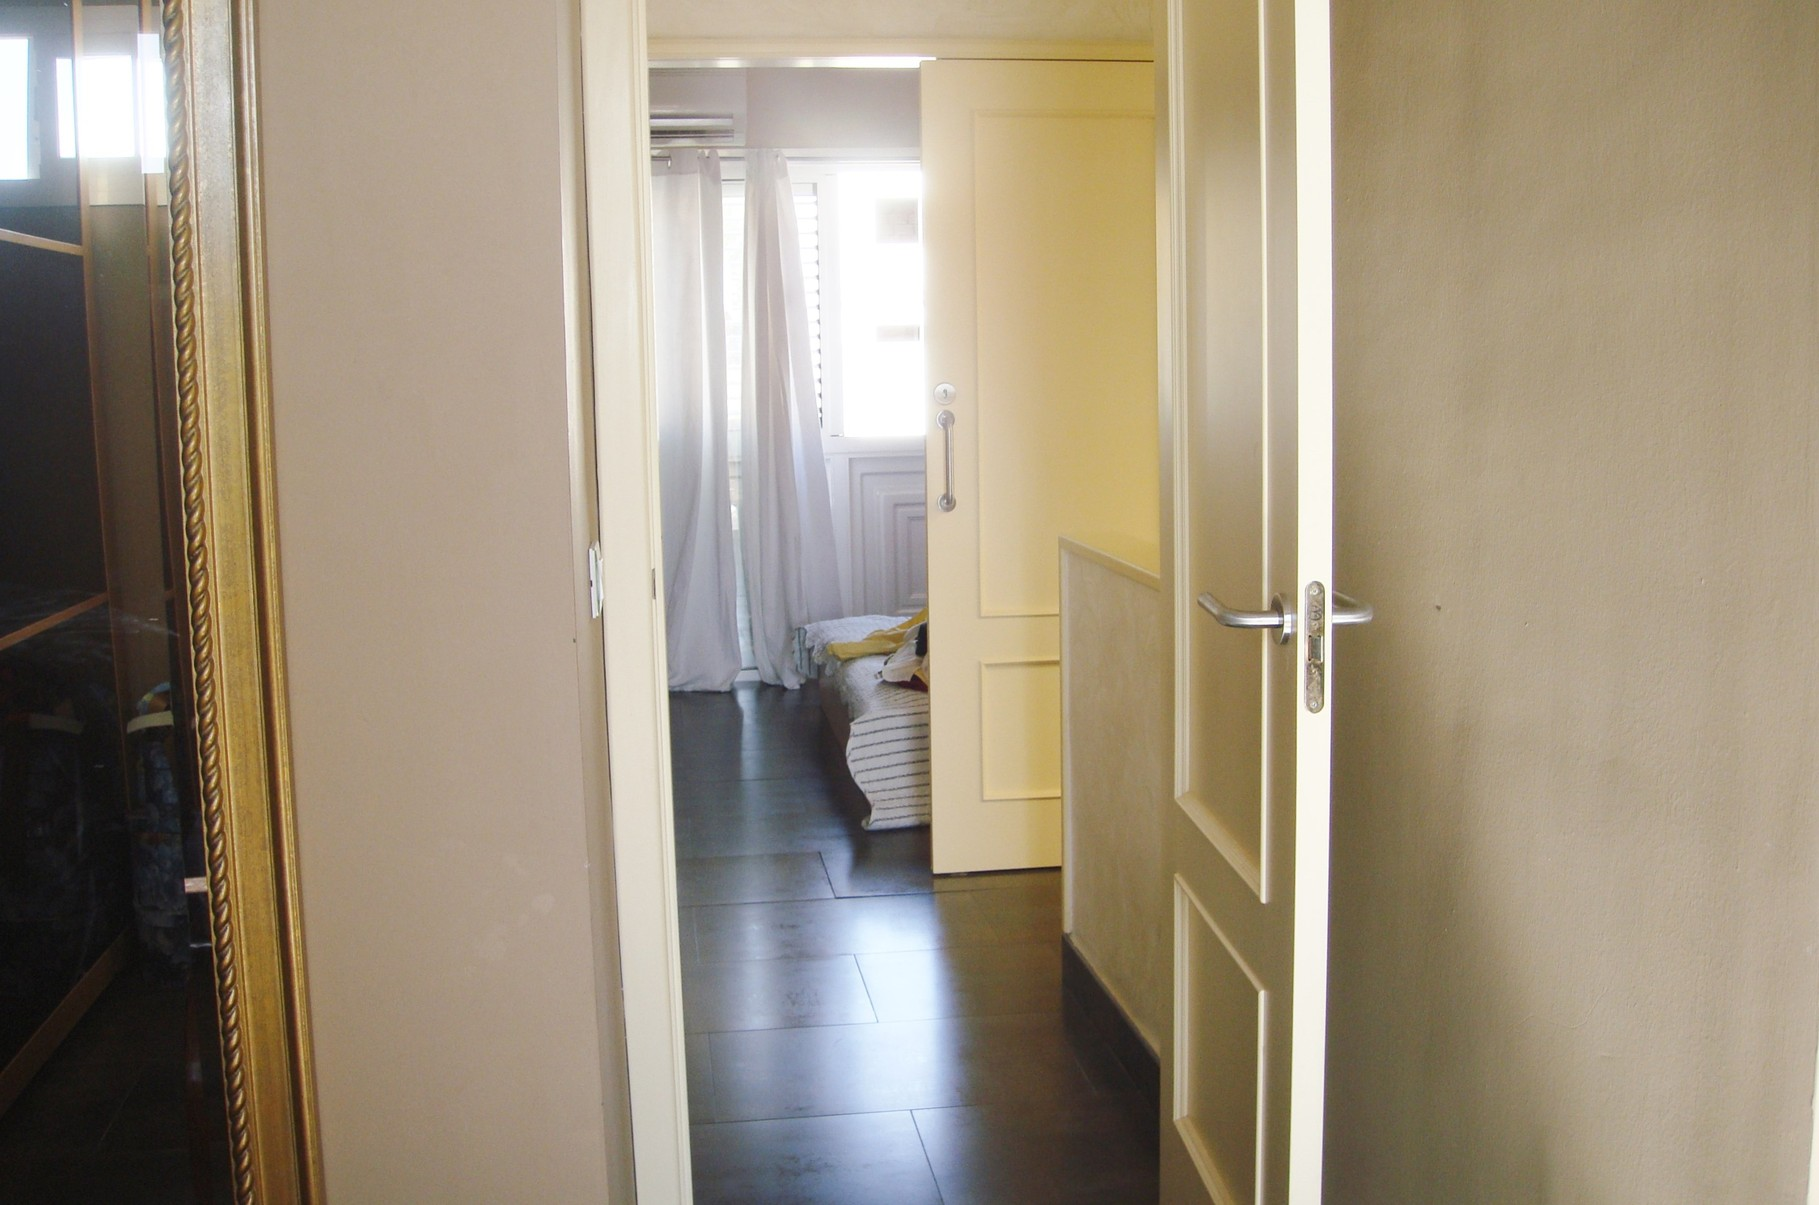 Inmobiliarias tenerife alquiler de pisos y venta de casas for Pisos de inmobiliarias